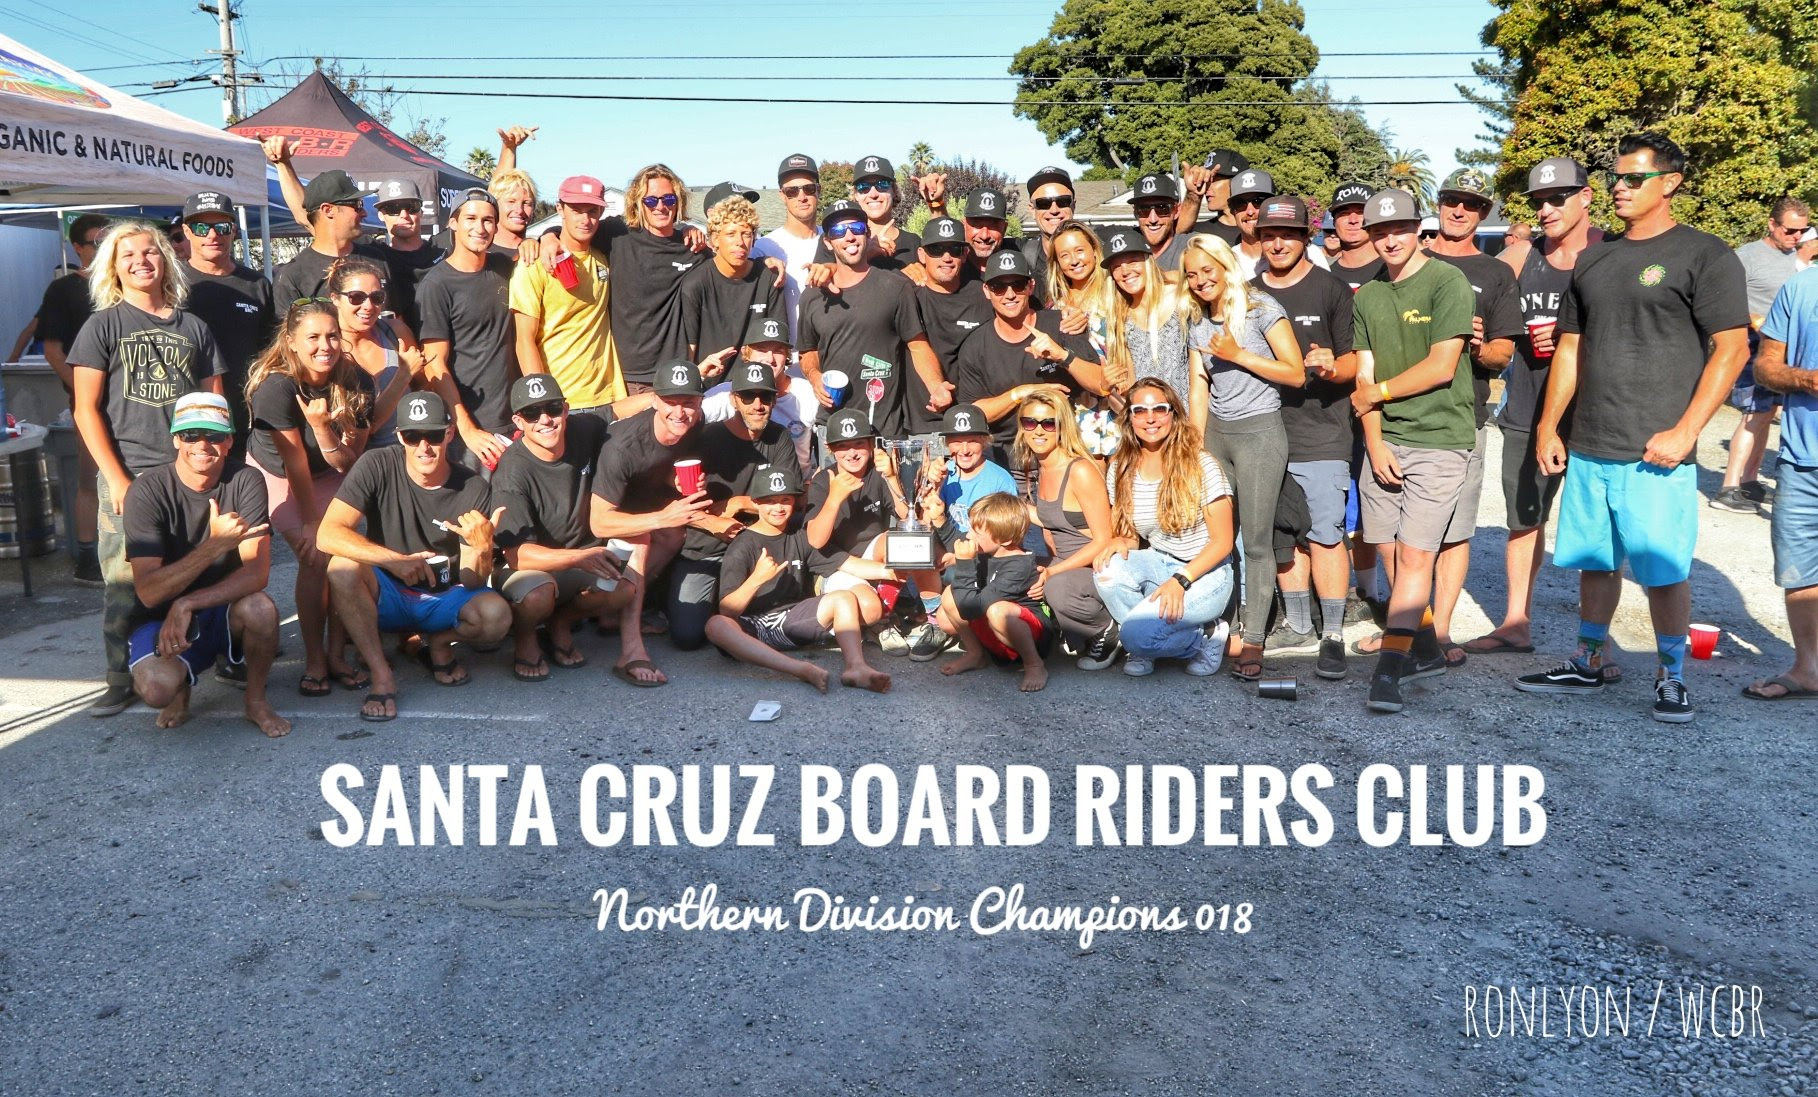 Santa Cruz Board Riders Club dominates the Santa Cruz event and is now the  Northern Division Champions 24e75feb0bf